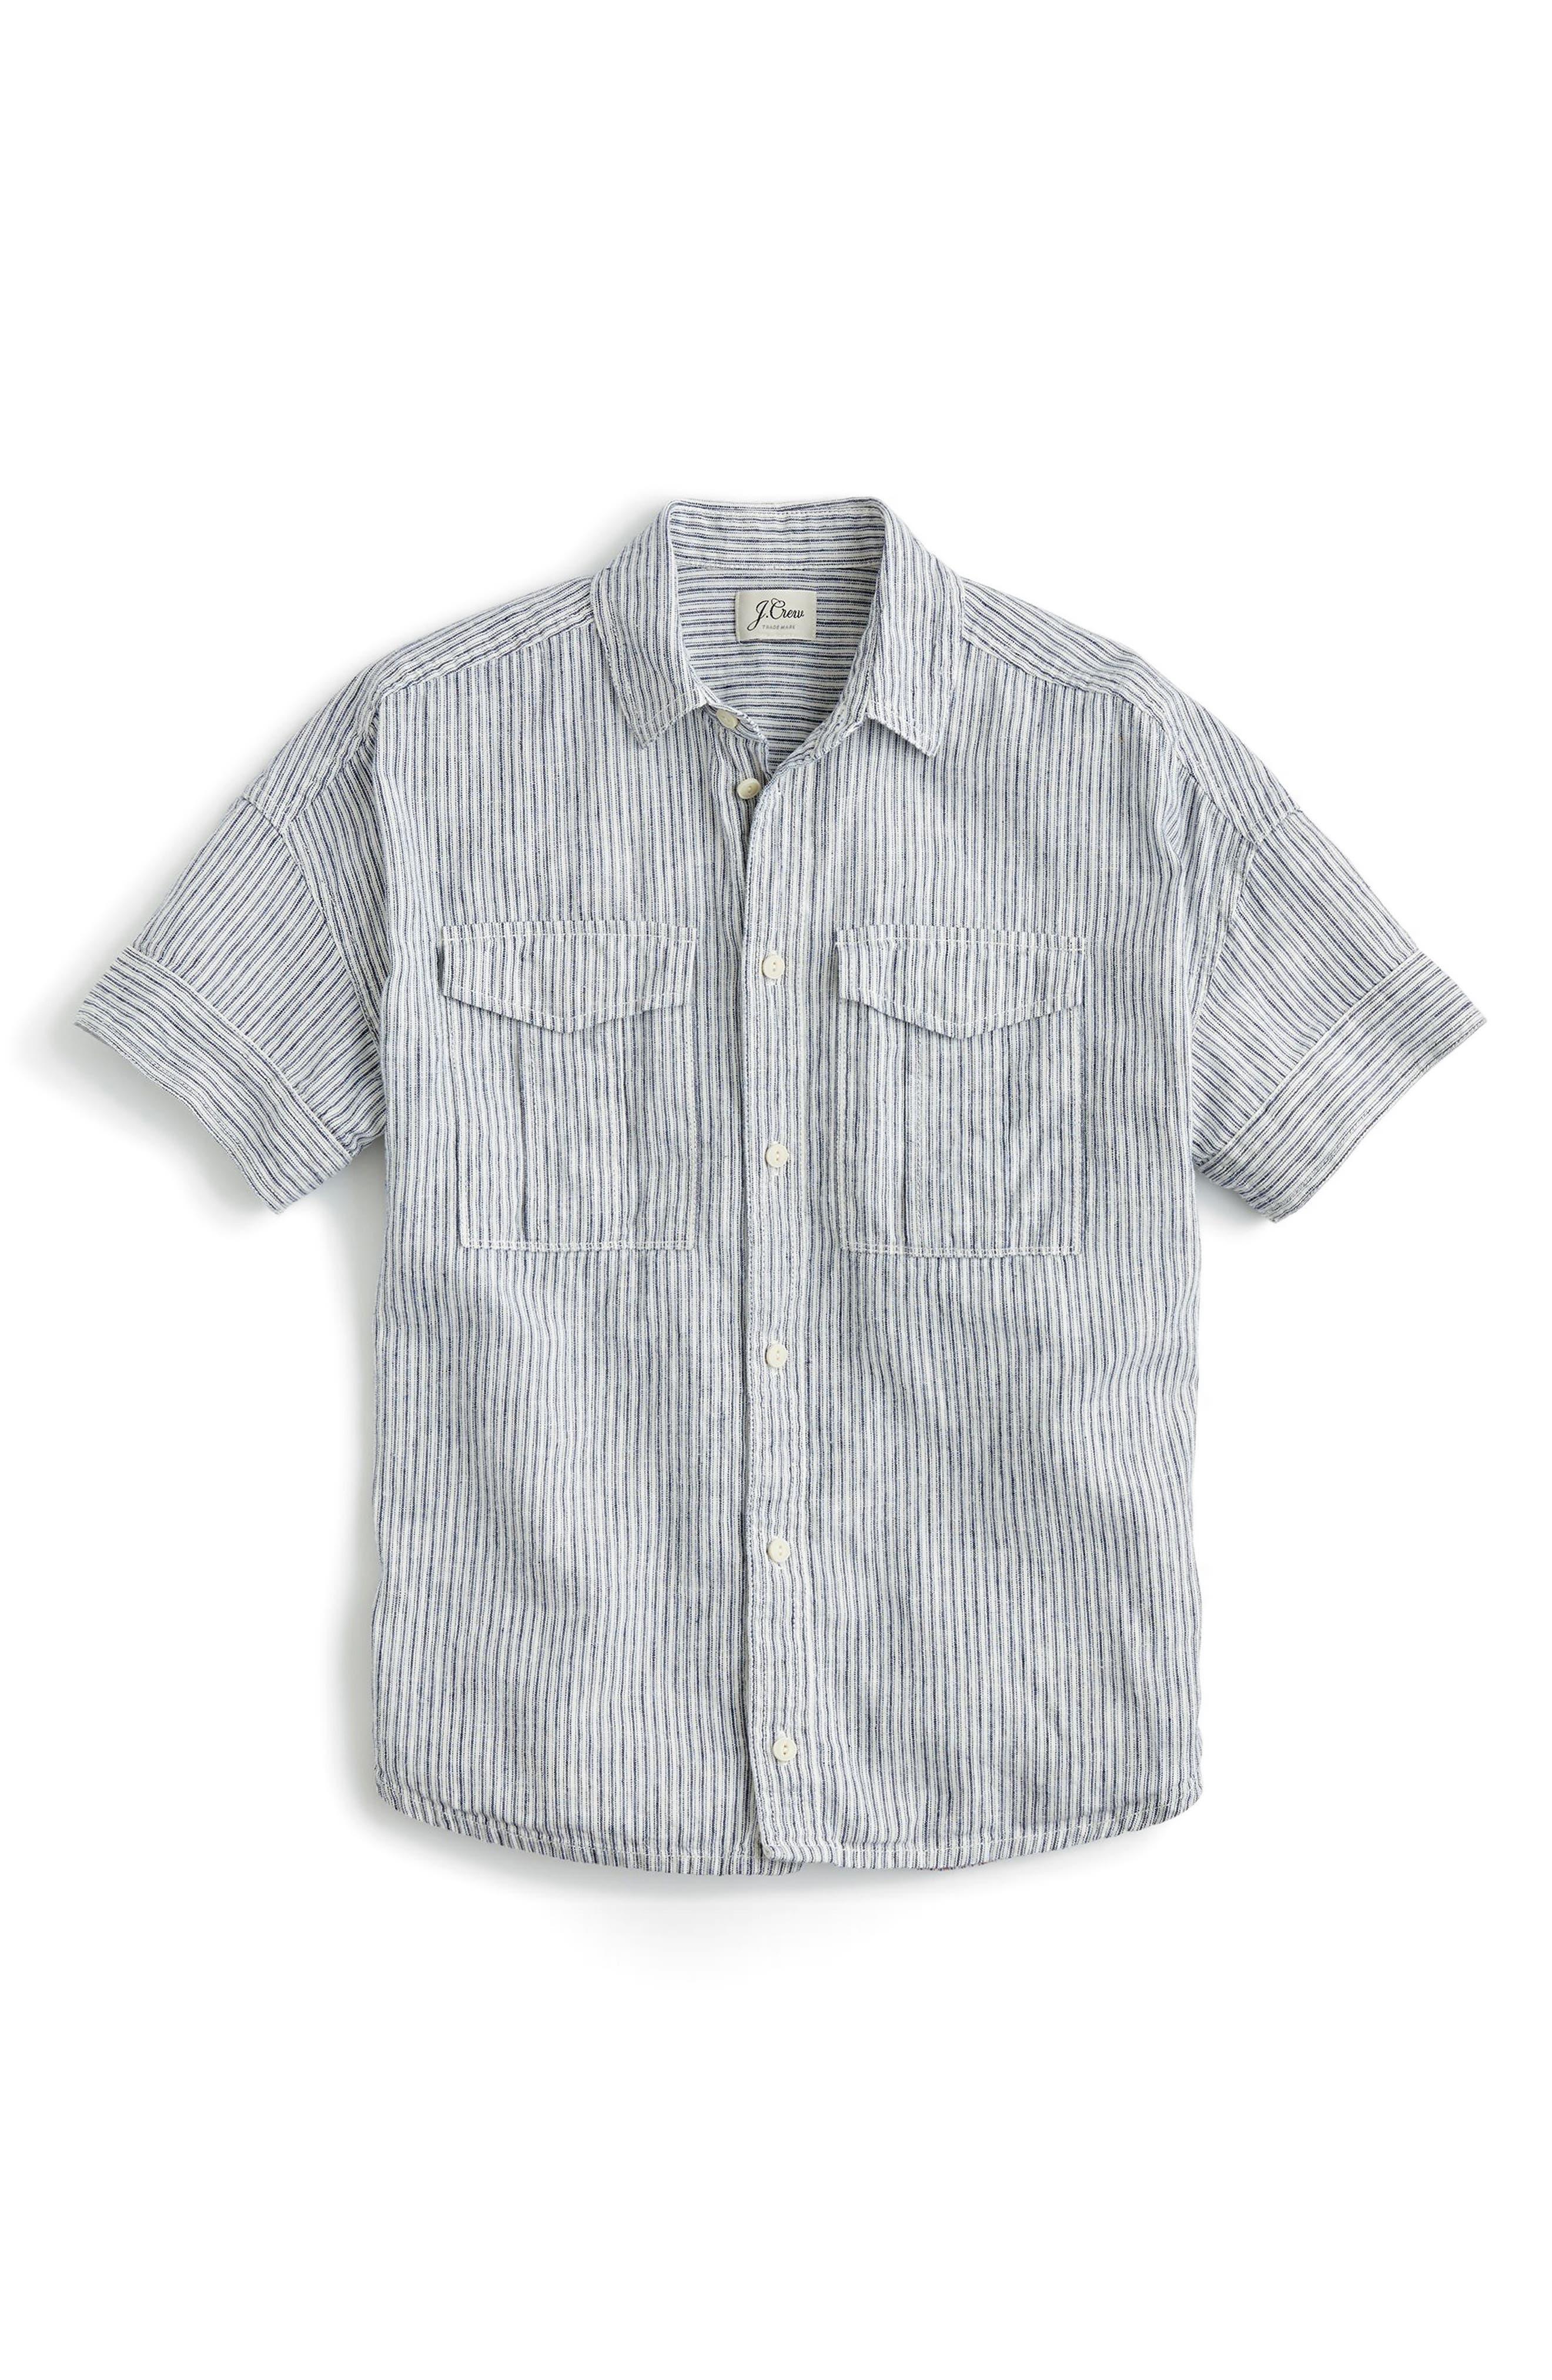 Utility Pocket Stripe Chambray Shirt,                             Alternate thumbnail 3, color,                             020